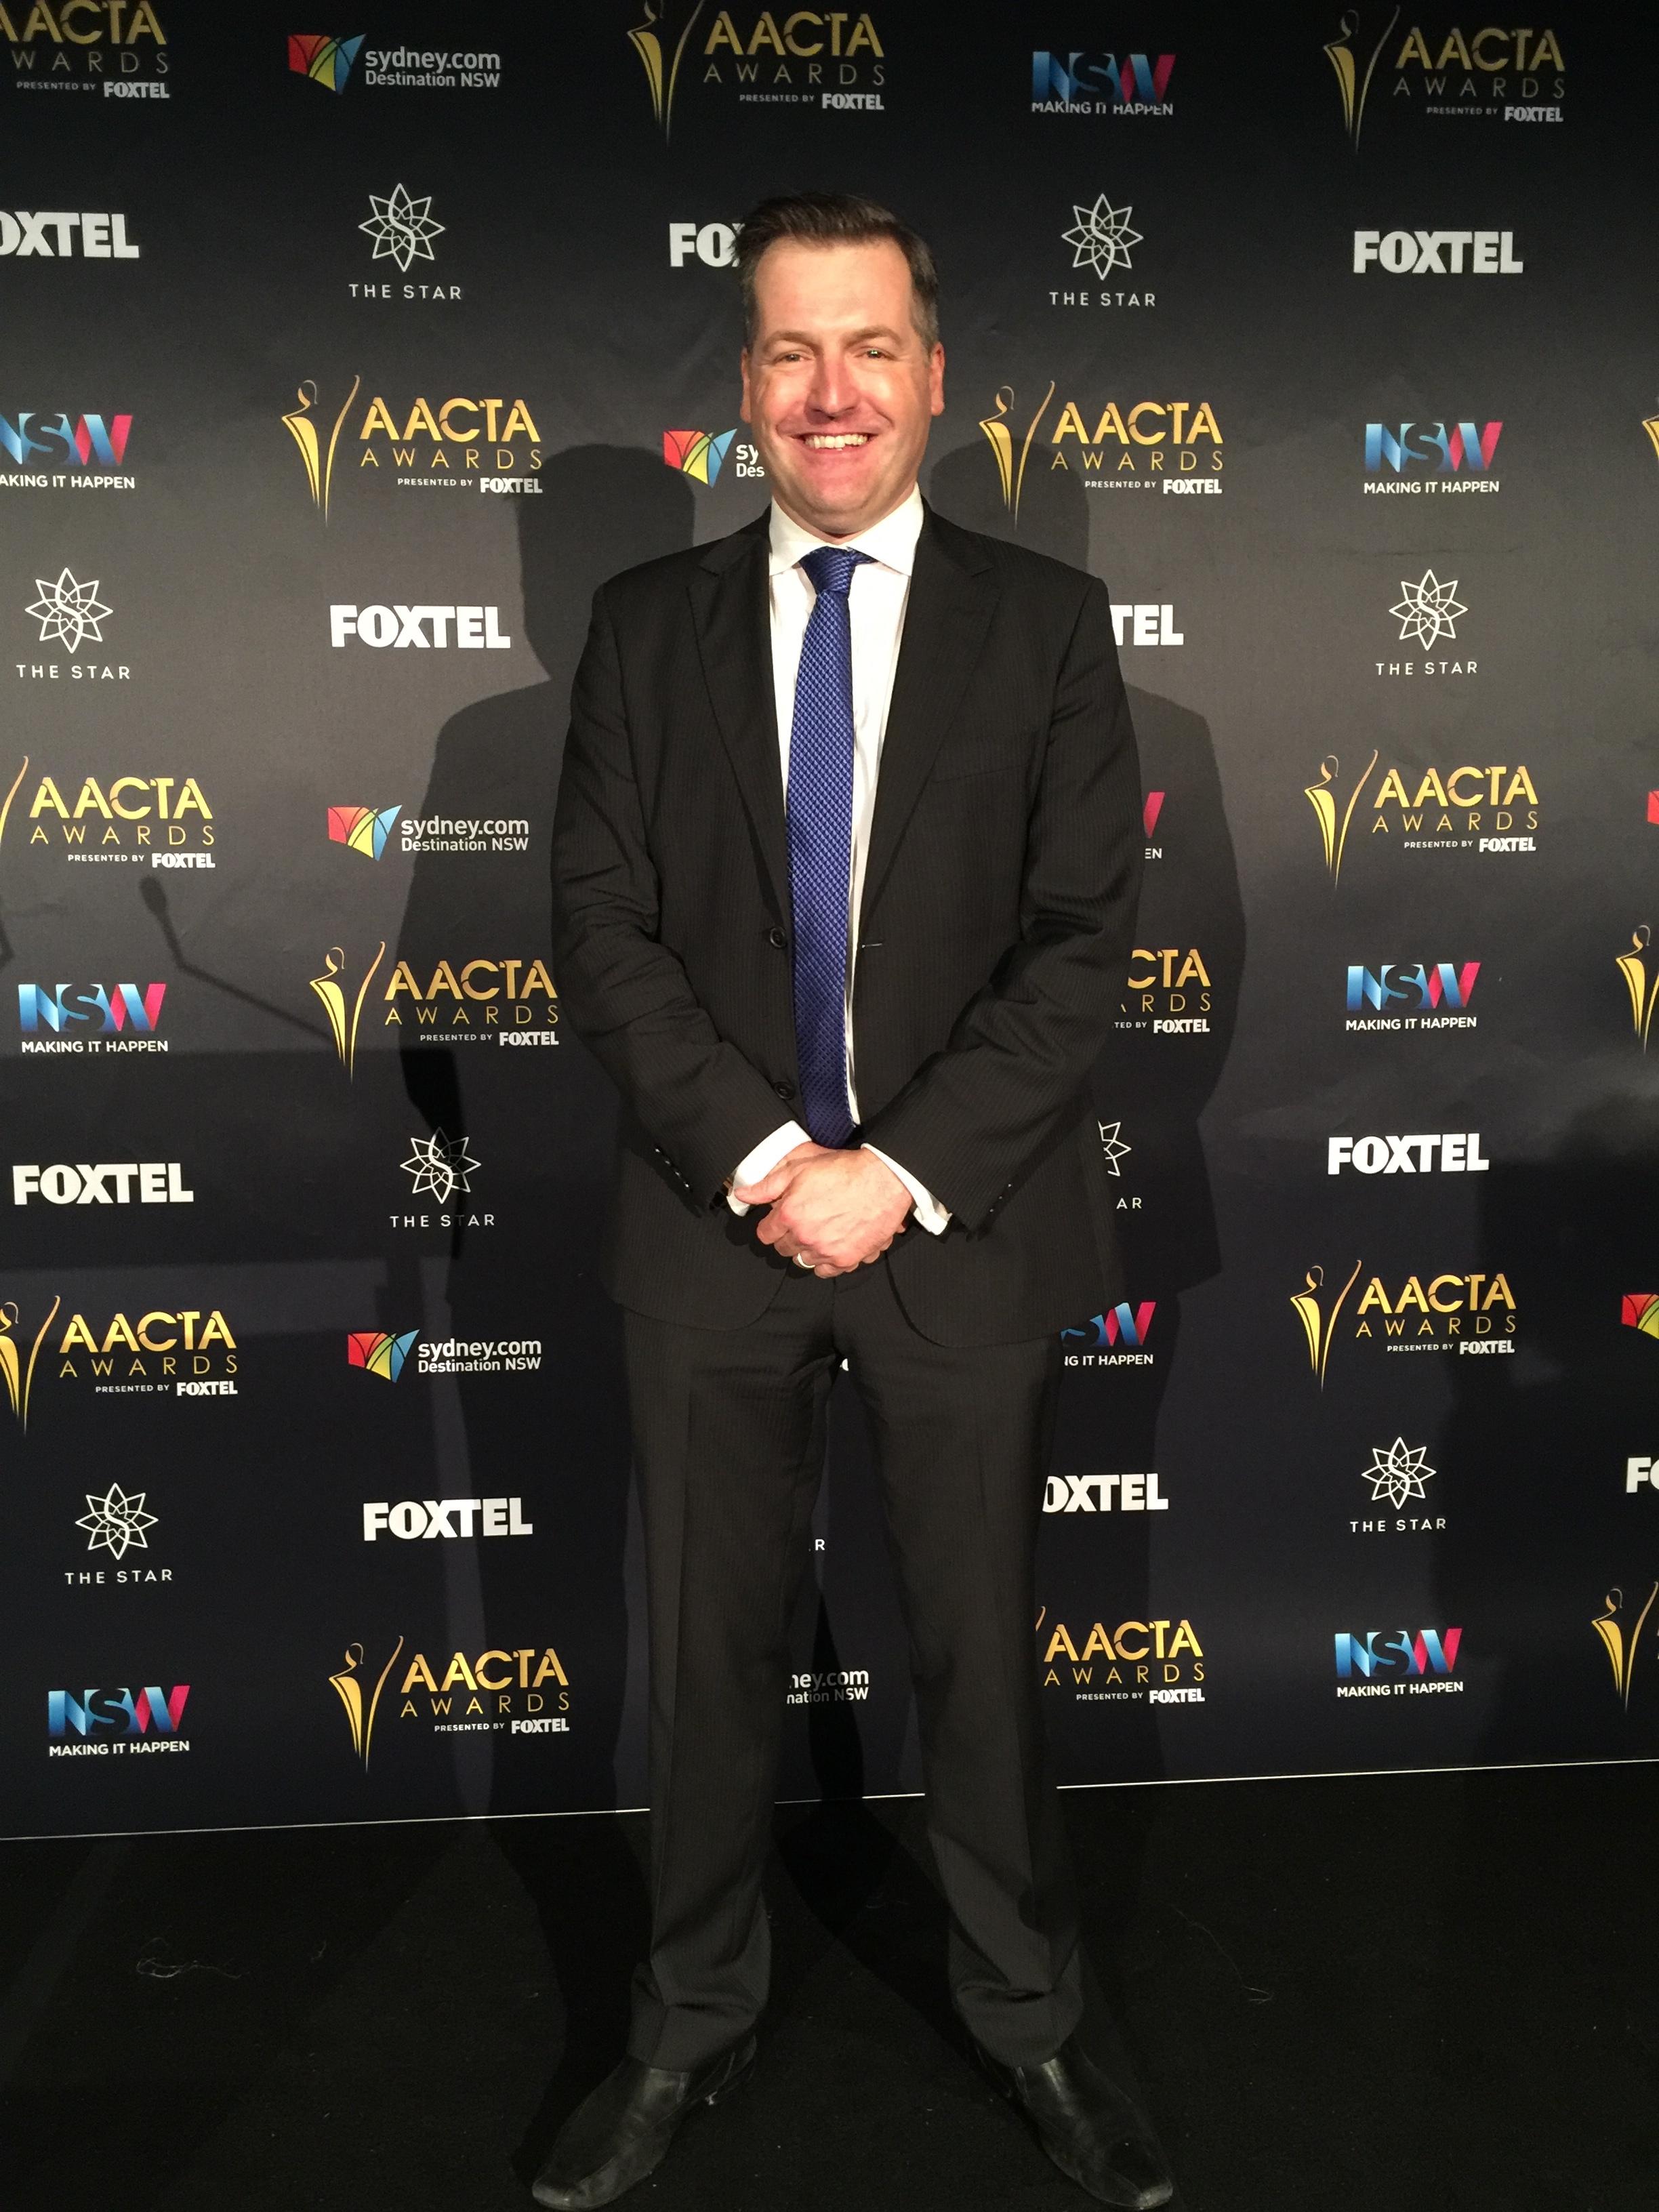 Giles Hardie hosts the AACTA Awards Media Room